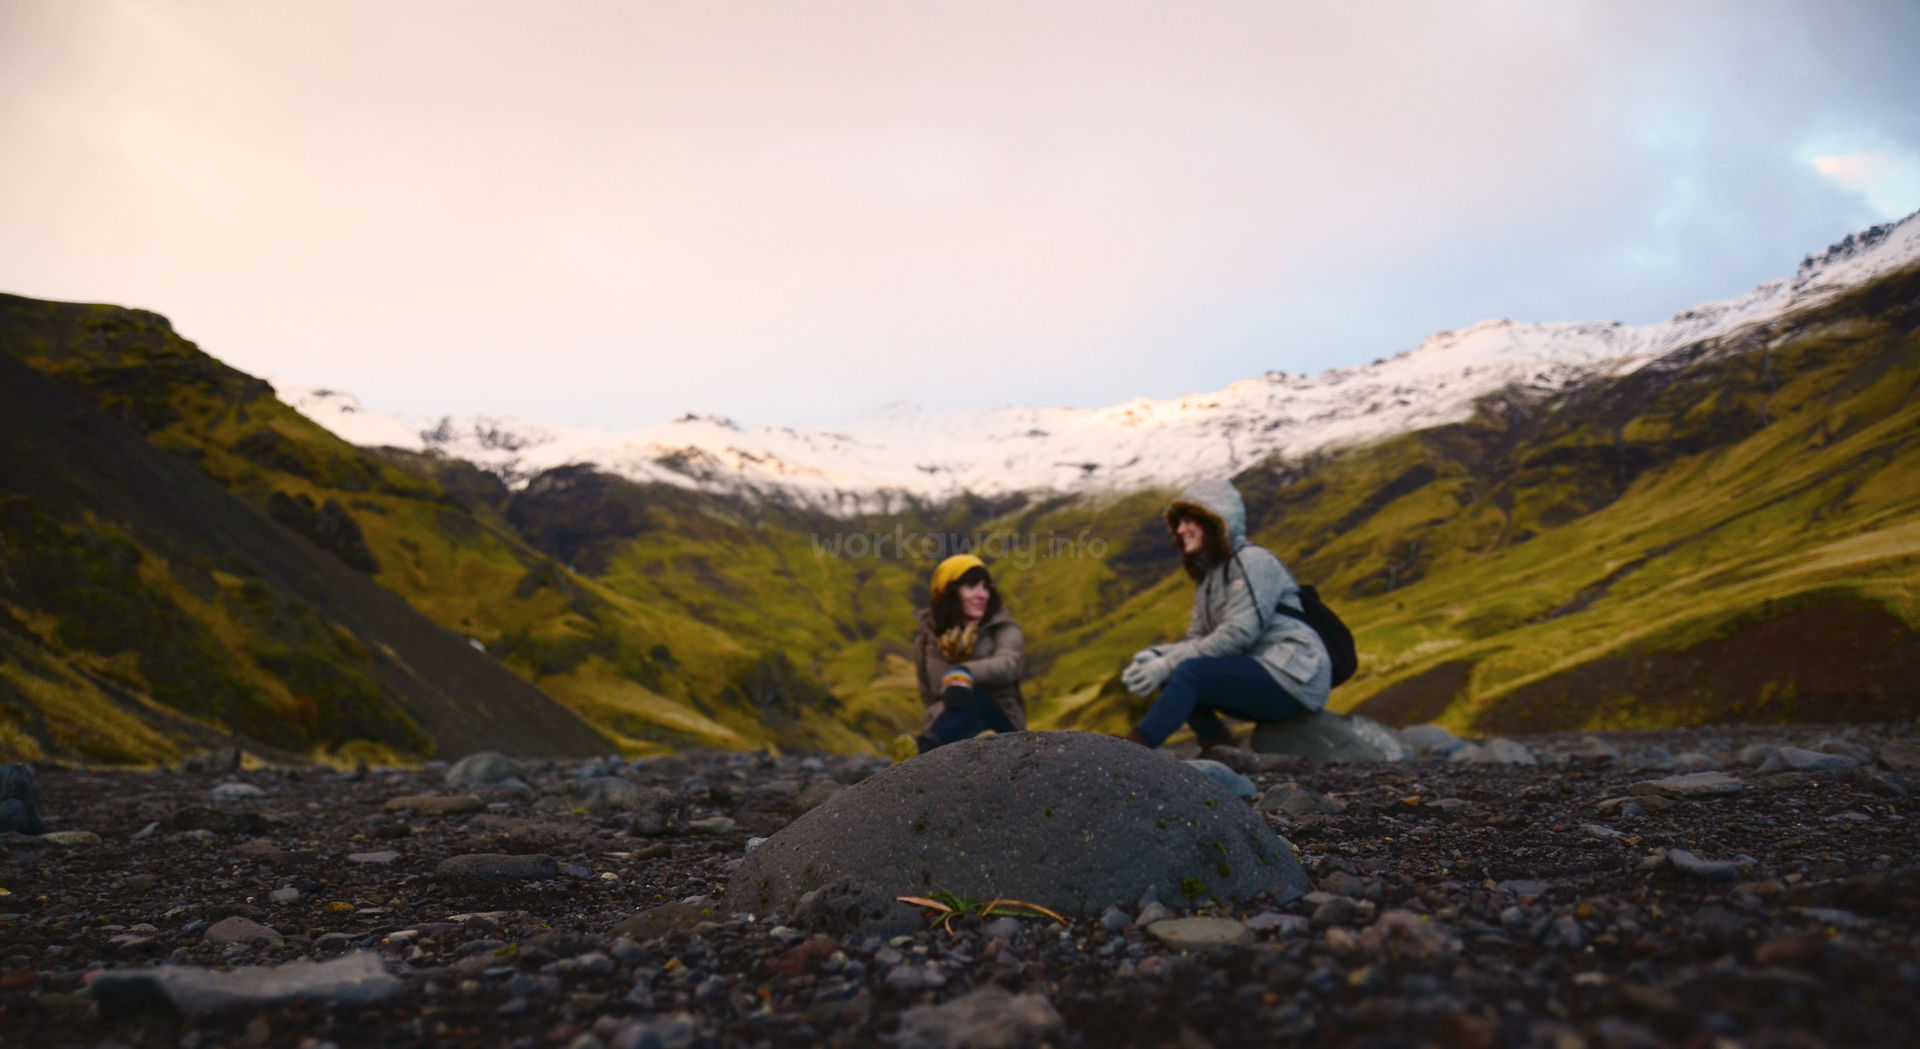 female workawayers chatting and enjoying mountain scenery